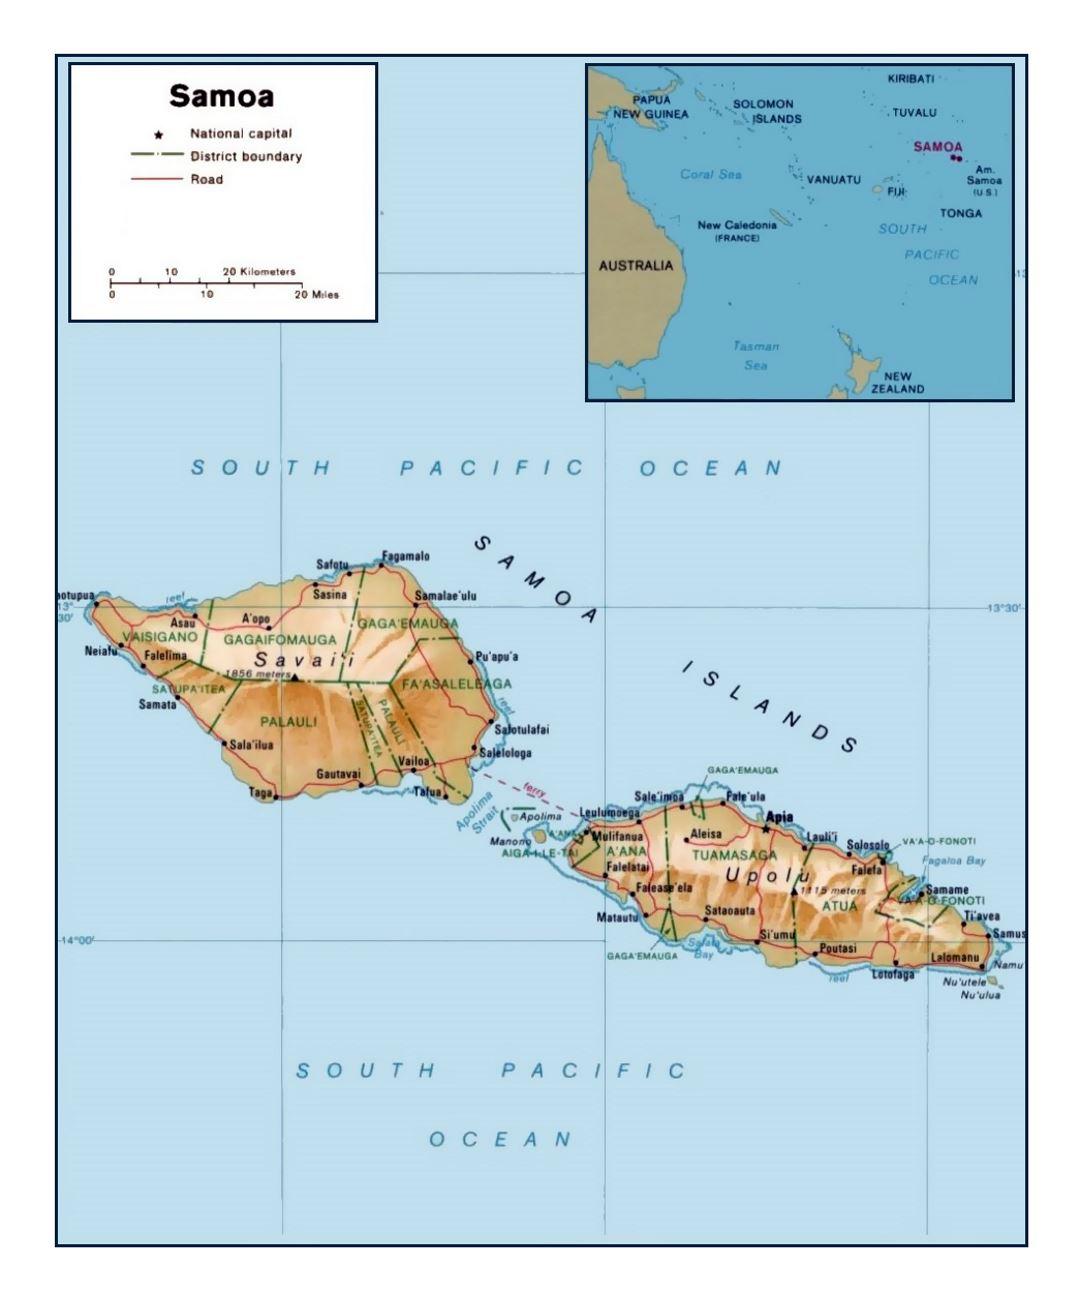 Detailed political and administrative map of Samoa with ... on samoa and guam on map, nile river on world map, aegean sea on world map, samoa city, samoa animals, borneo on world map, samoan islands world map, persian gulf on world map, niger river on world map, cayman islands on world map, midway island on world map, yellow river on world map, jarvis island on world map, samoa on a world map, samoa capital, boston location map, honshu on world map, amazon river on world map, lake superior on world map, samoa on the map,